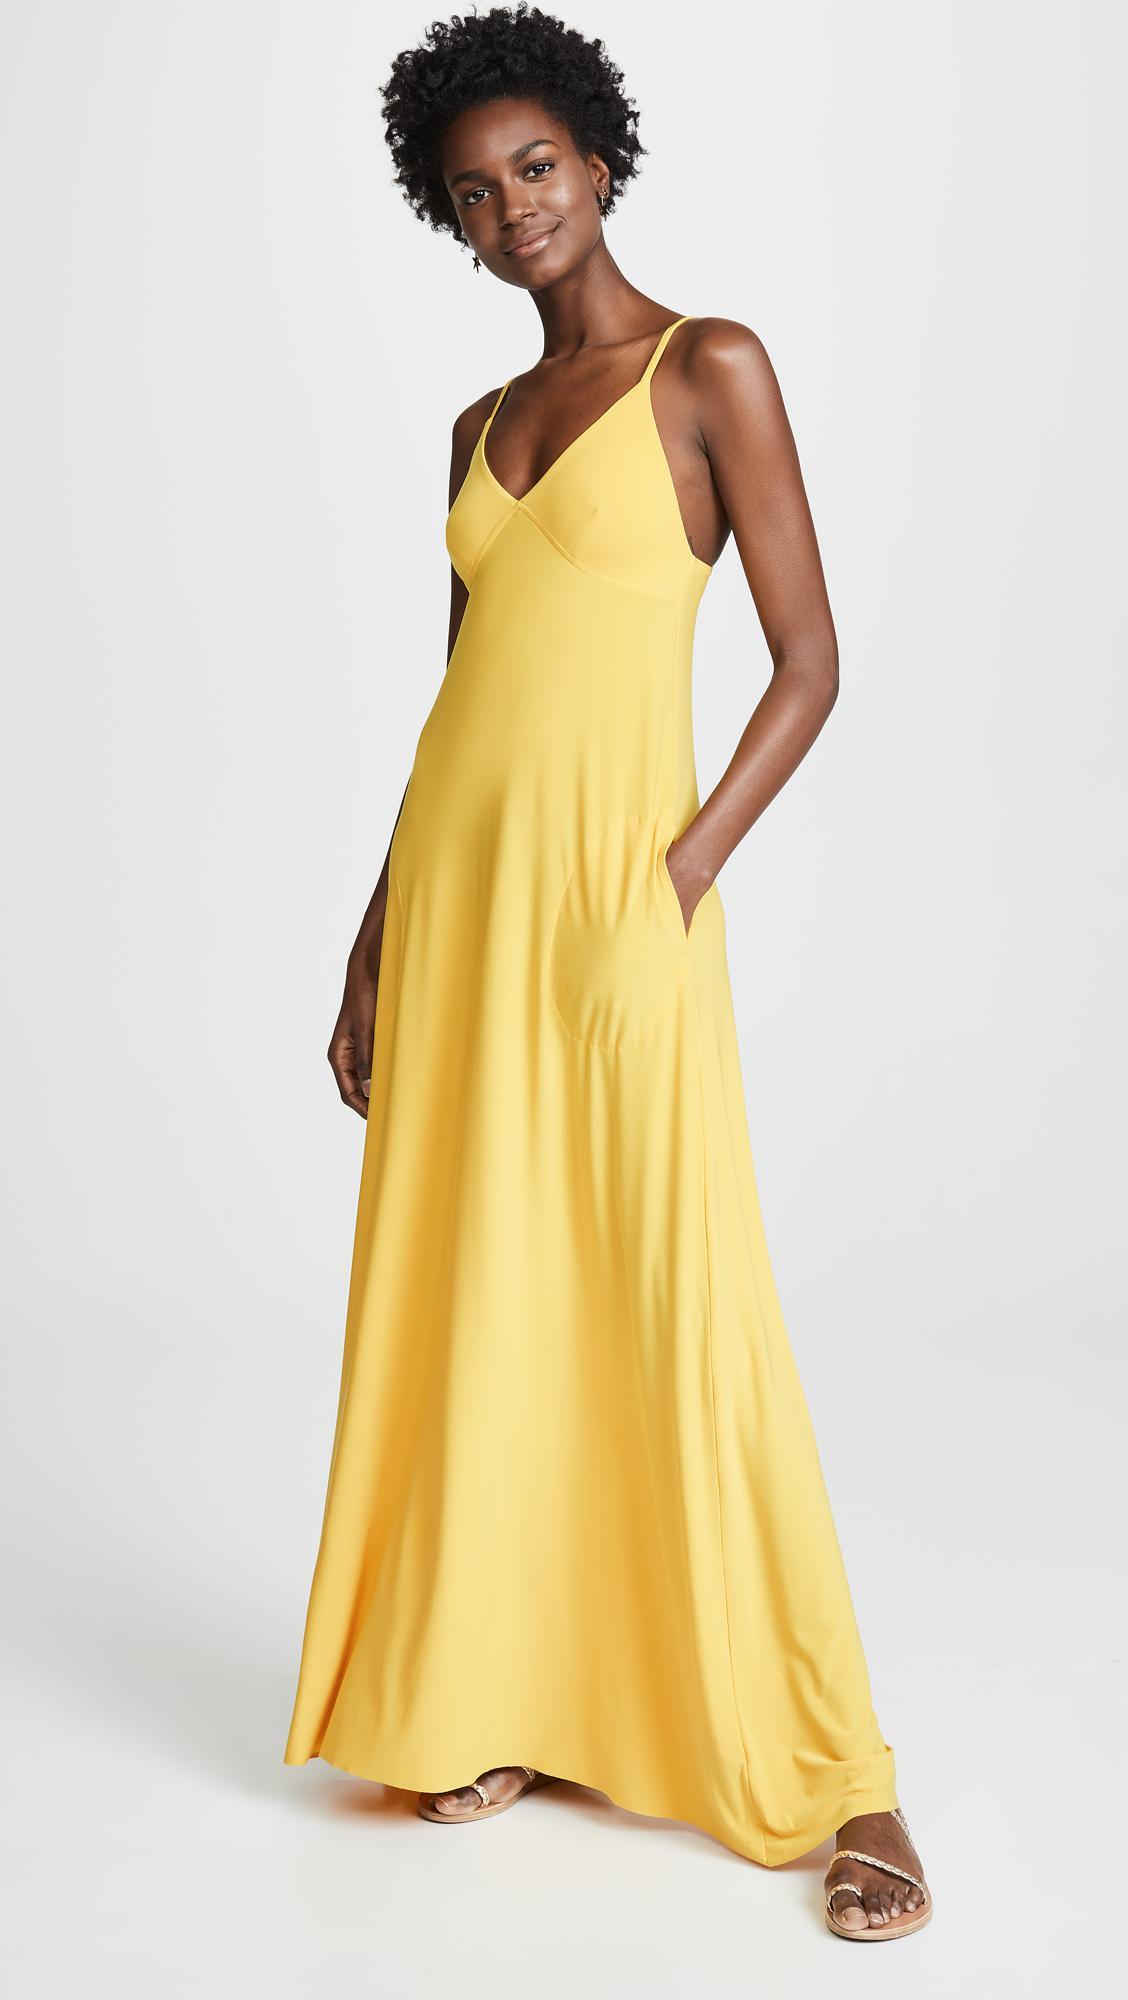 8b4a4c0f0ef4 Lyst - Norma Kamali A-line Slip Dress in Metallic